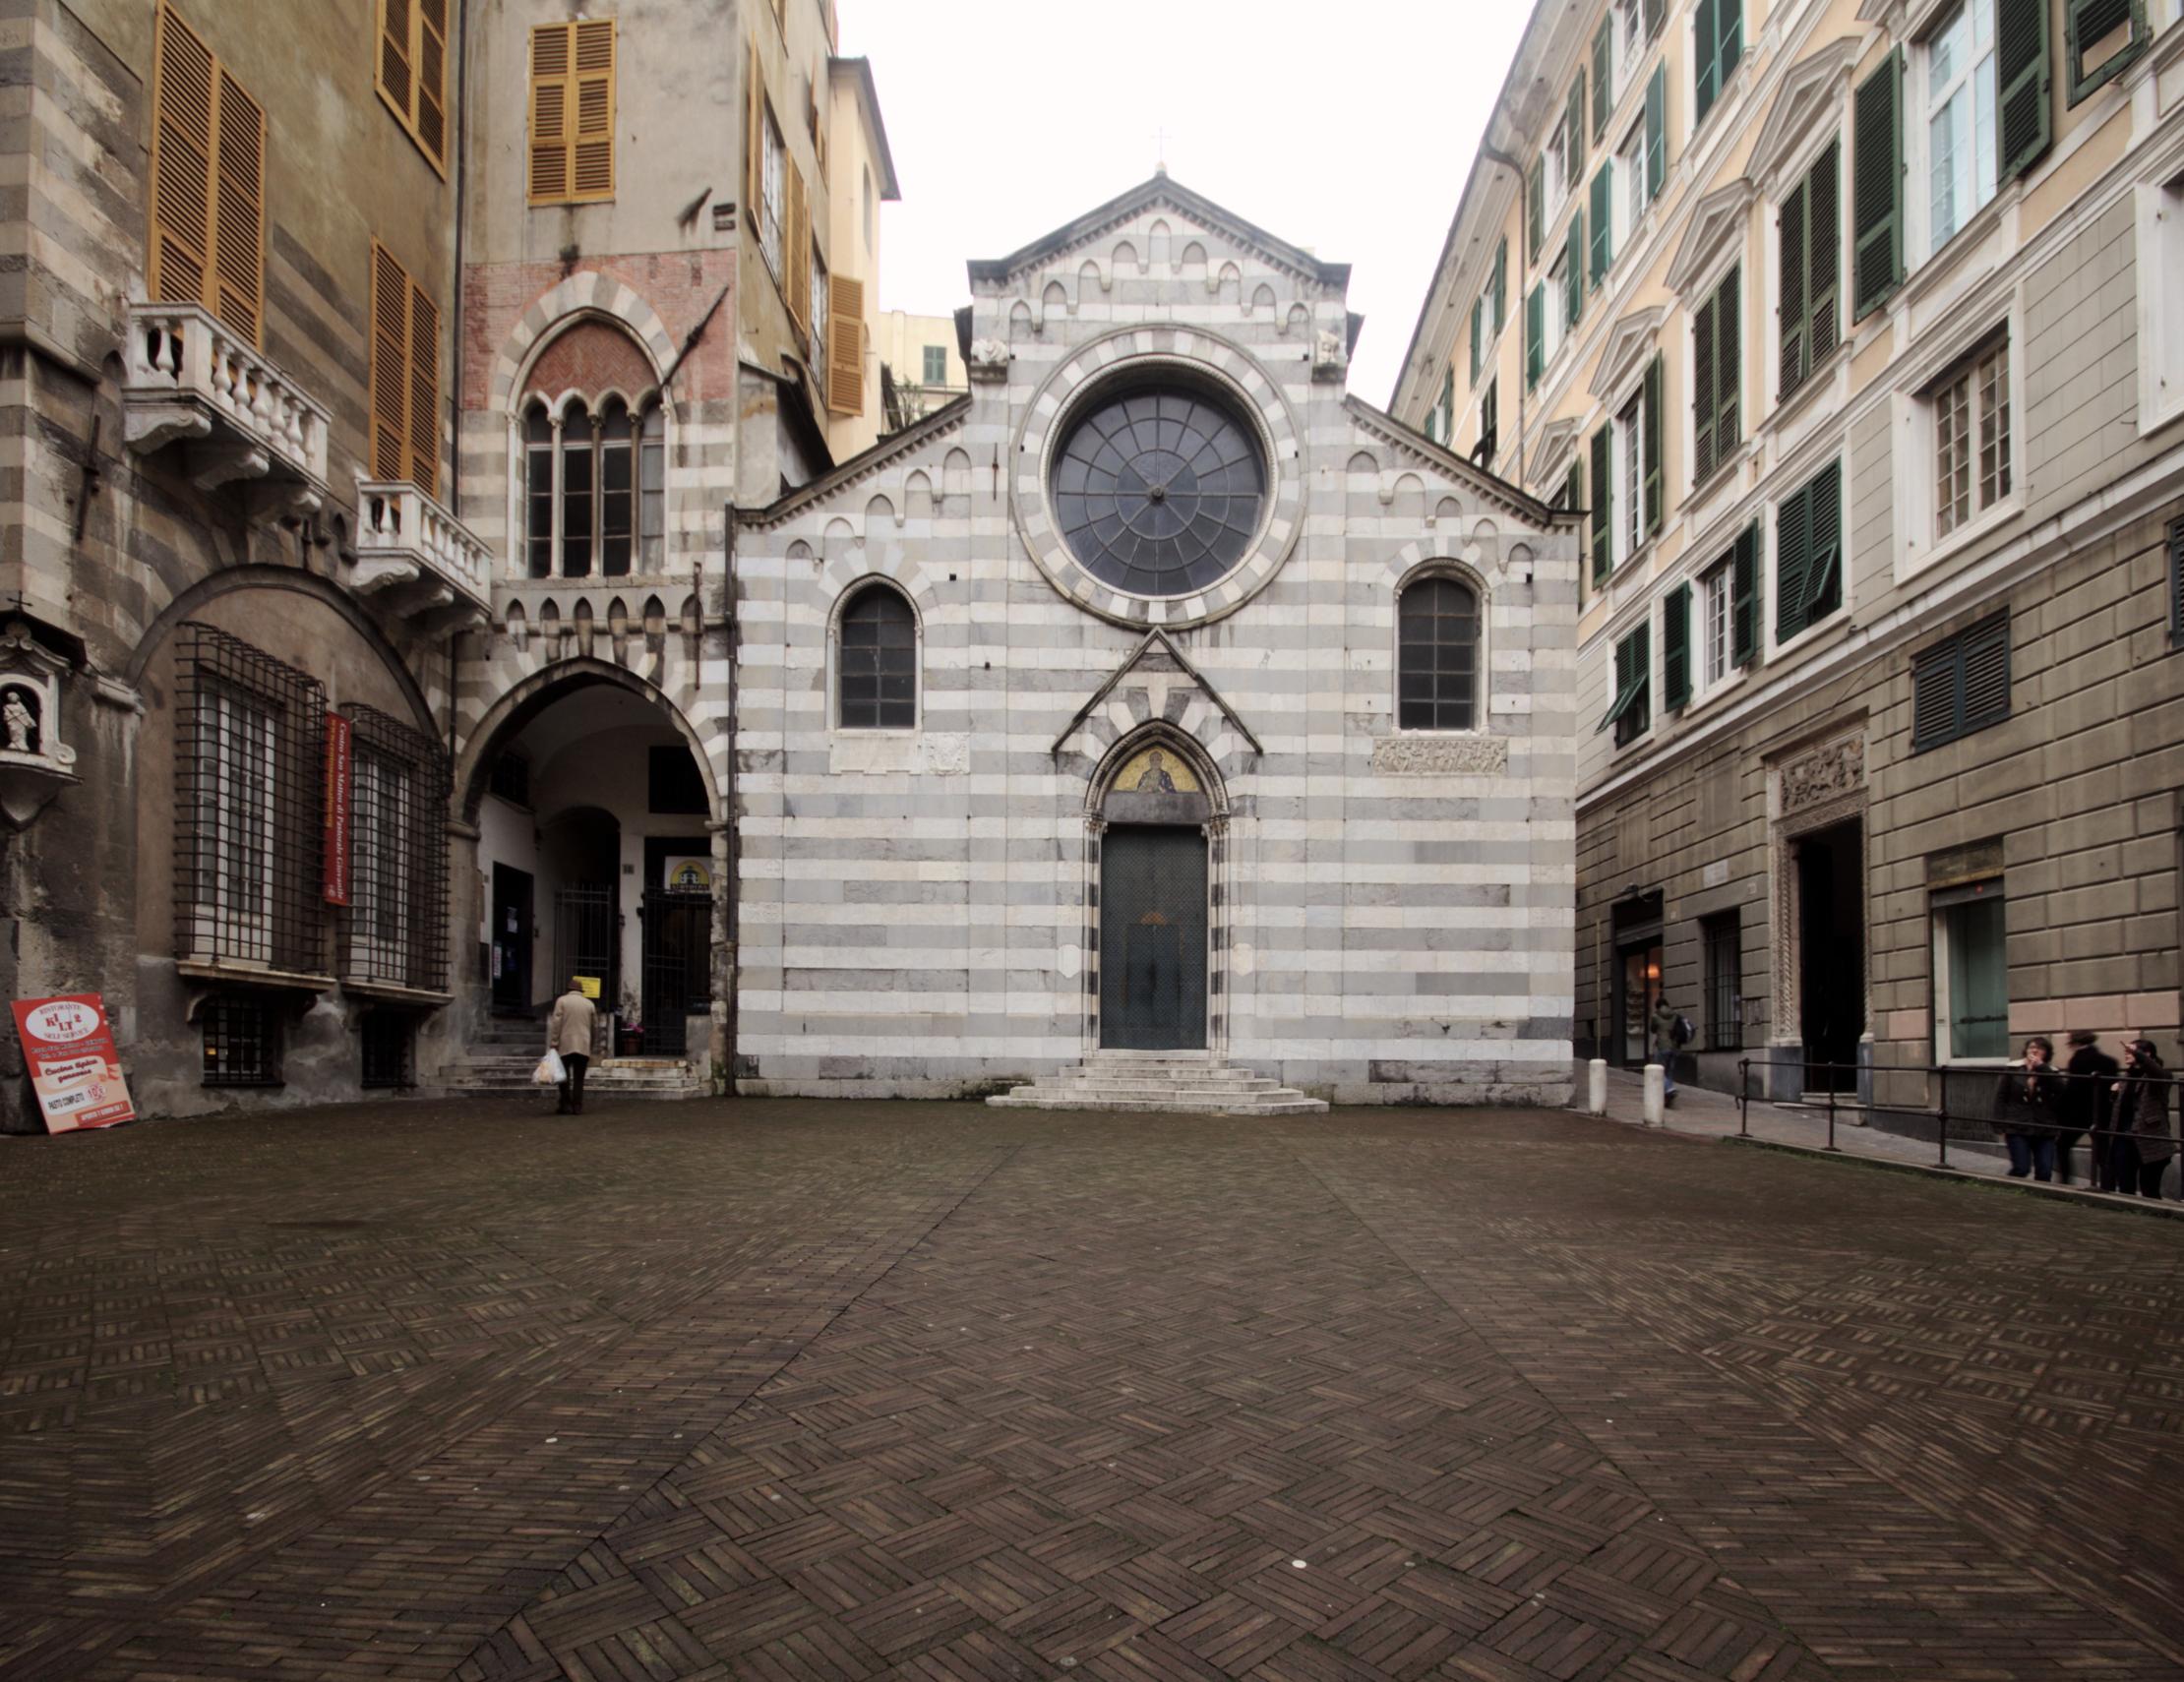 File:San Matteo - Genoa 2014.jpg - Wikimedia Commons